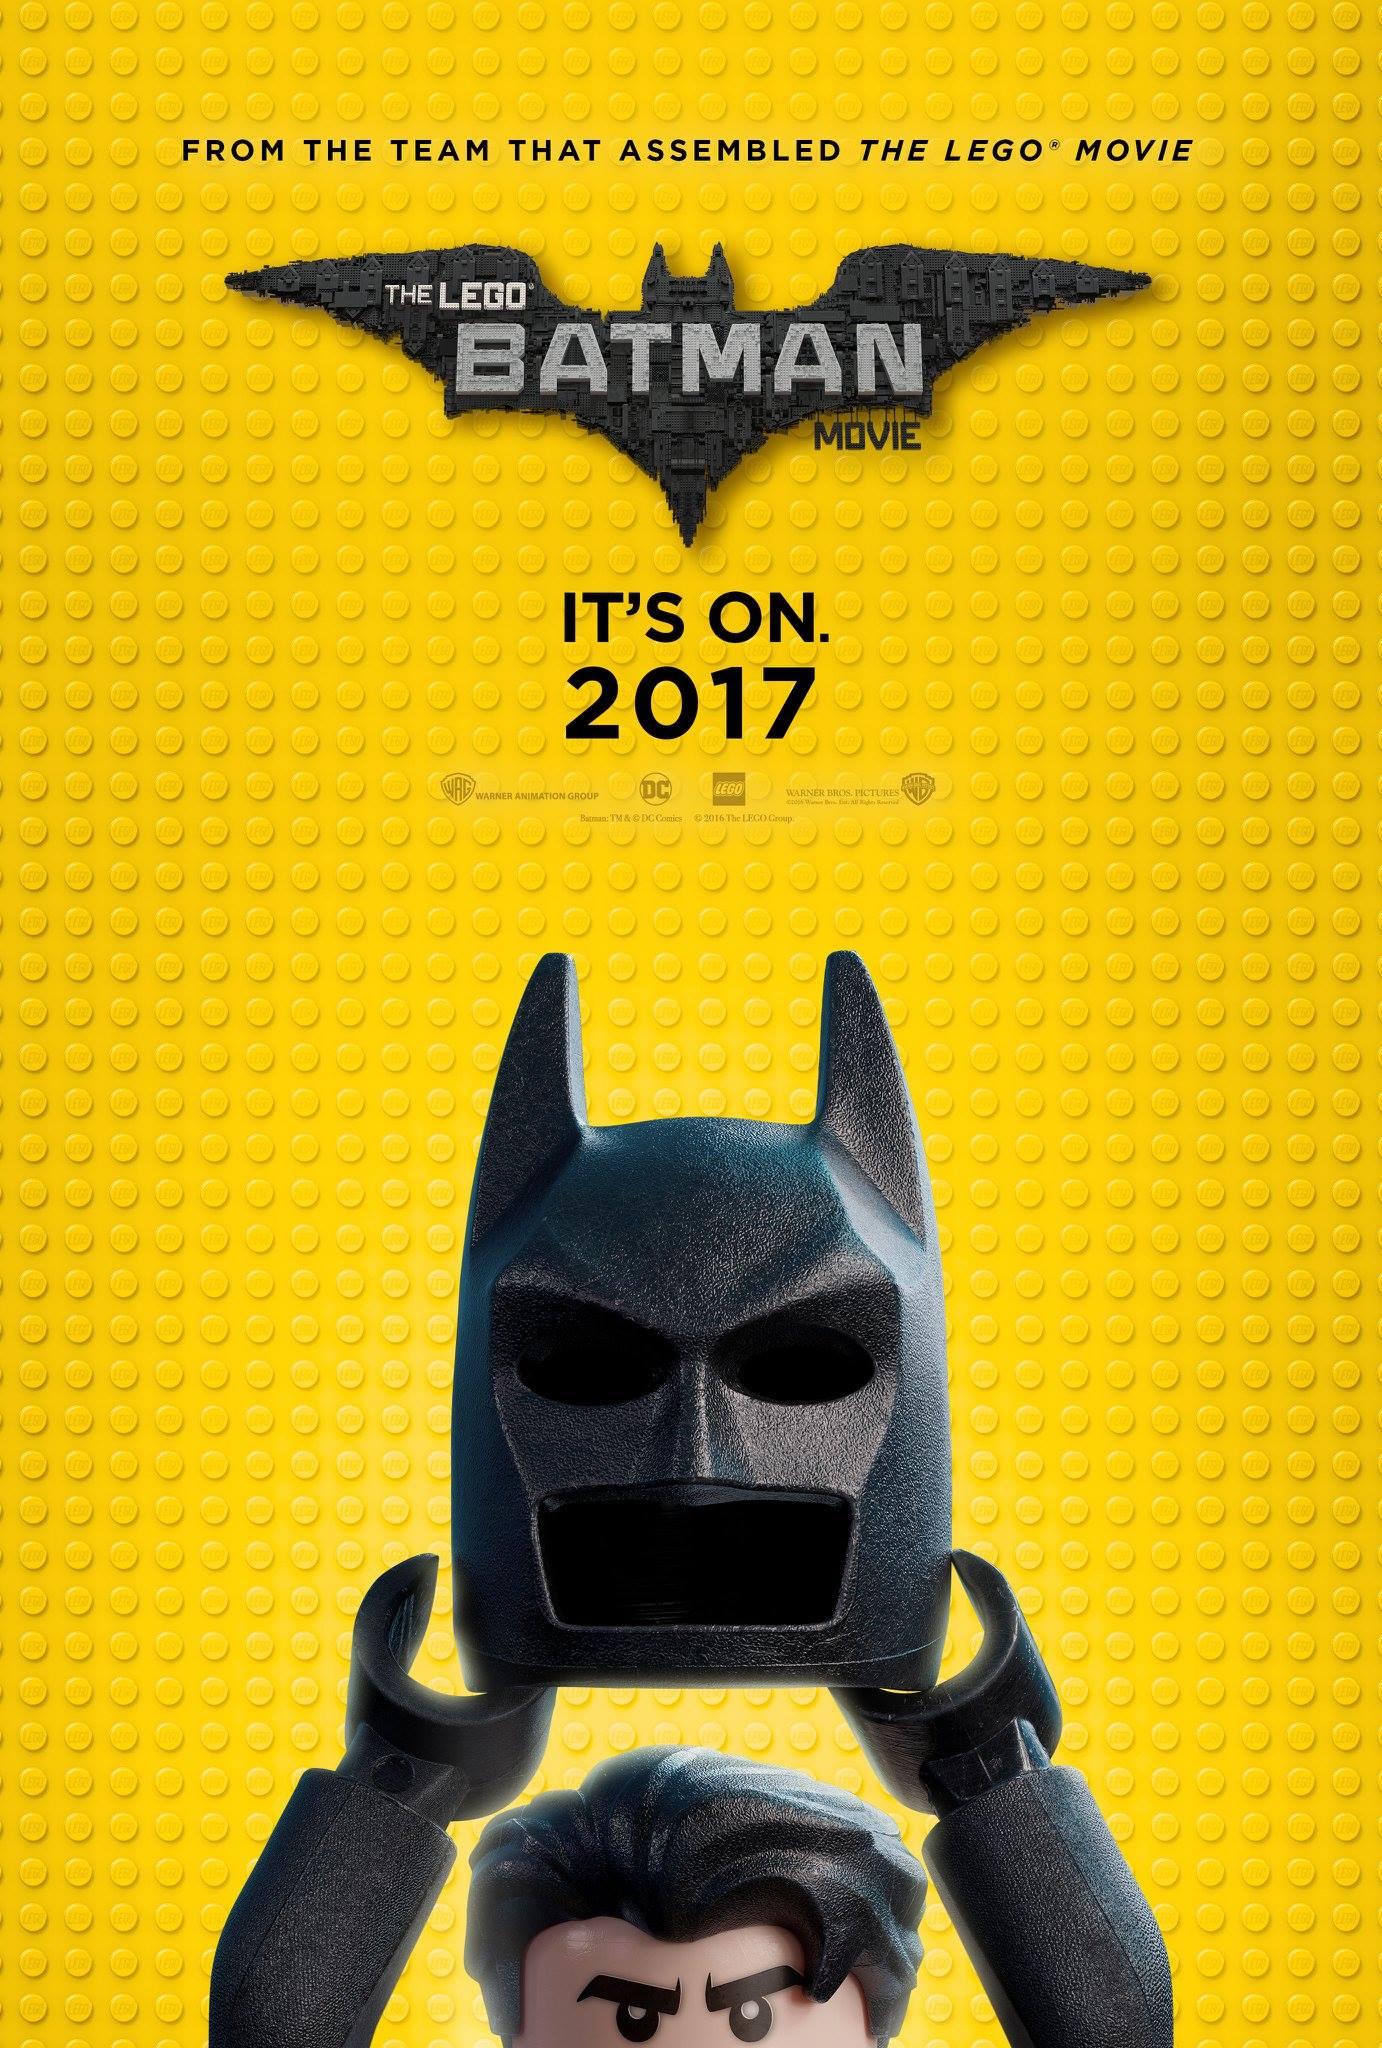 The_LEGO_Batman_Movie_poster-2.jpg